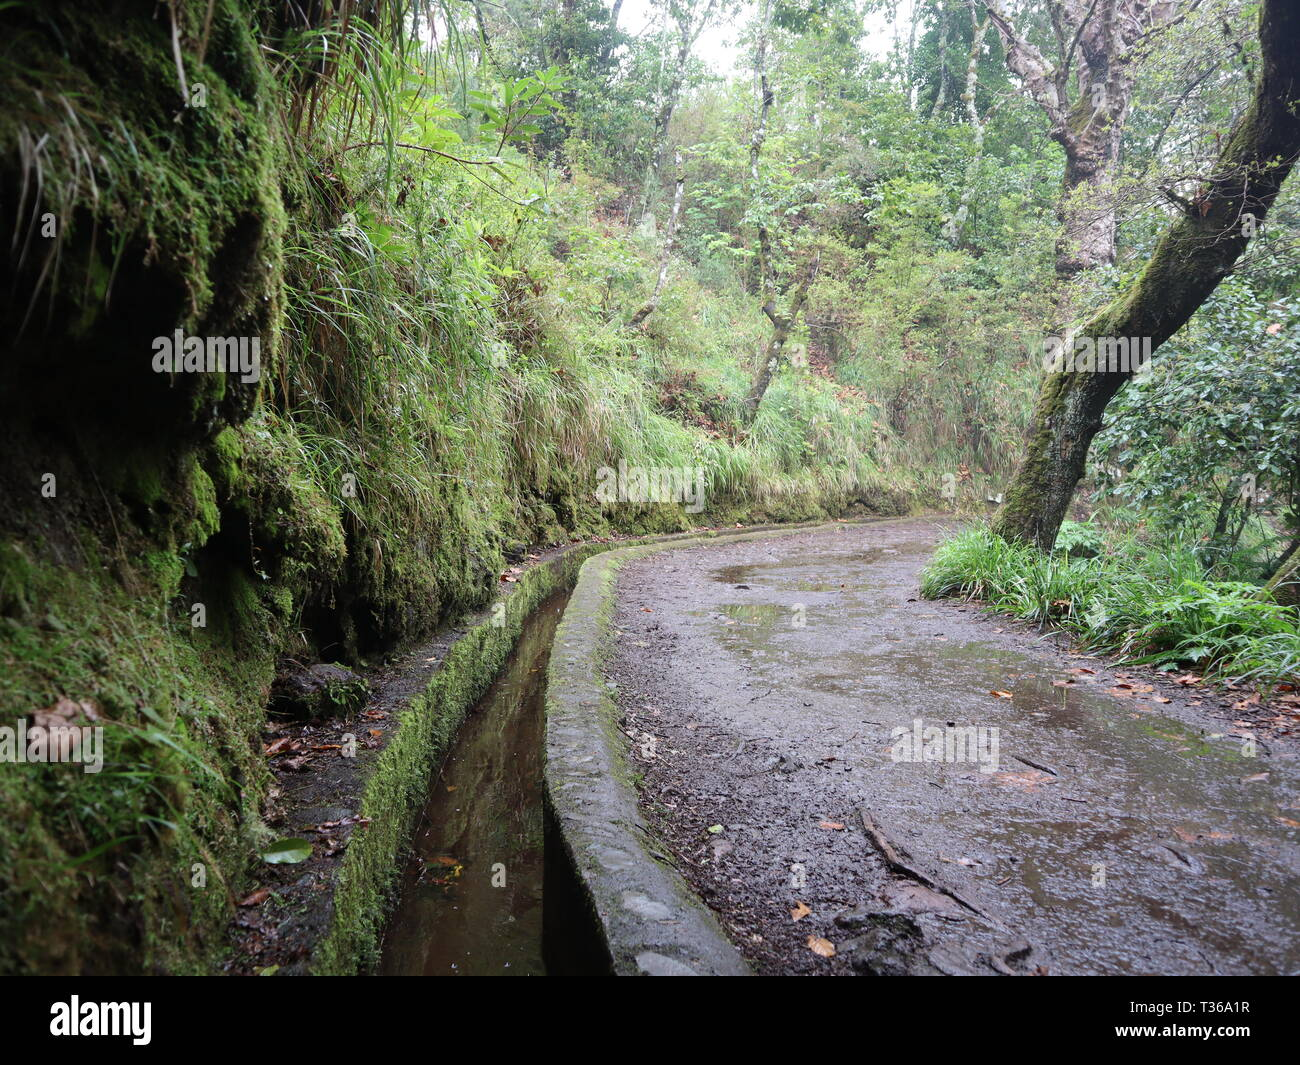 Levada walk in Madeira Islands, Portugal - Stock Image